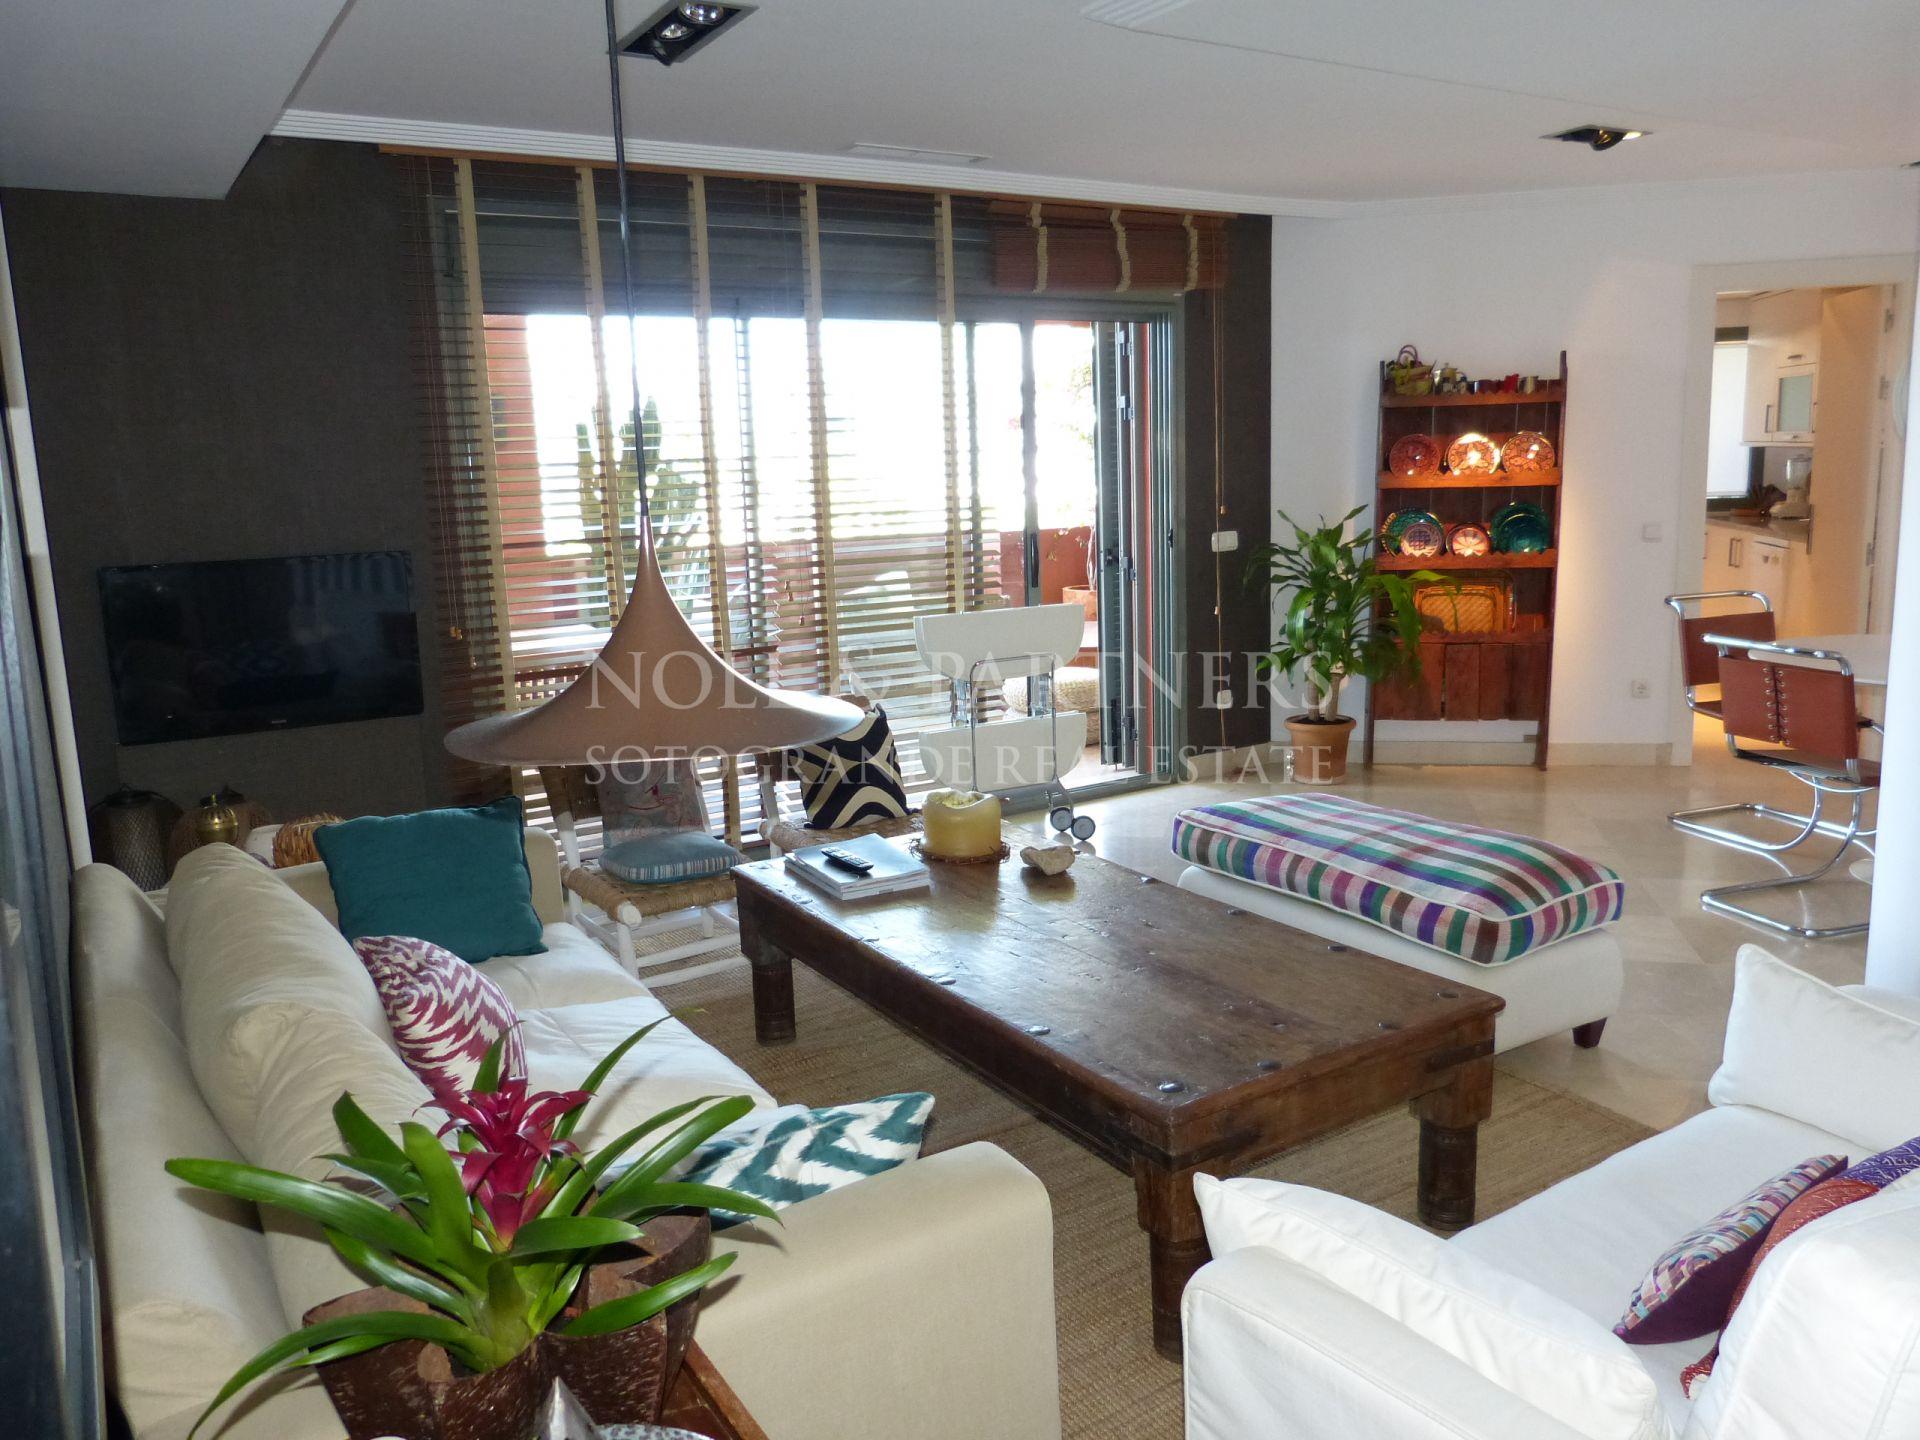 Isla Tortuga Sotogrande Marina, Apartment for sale